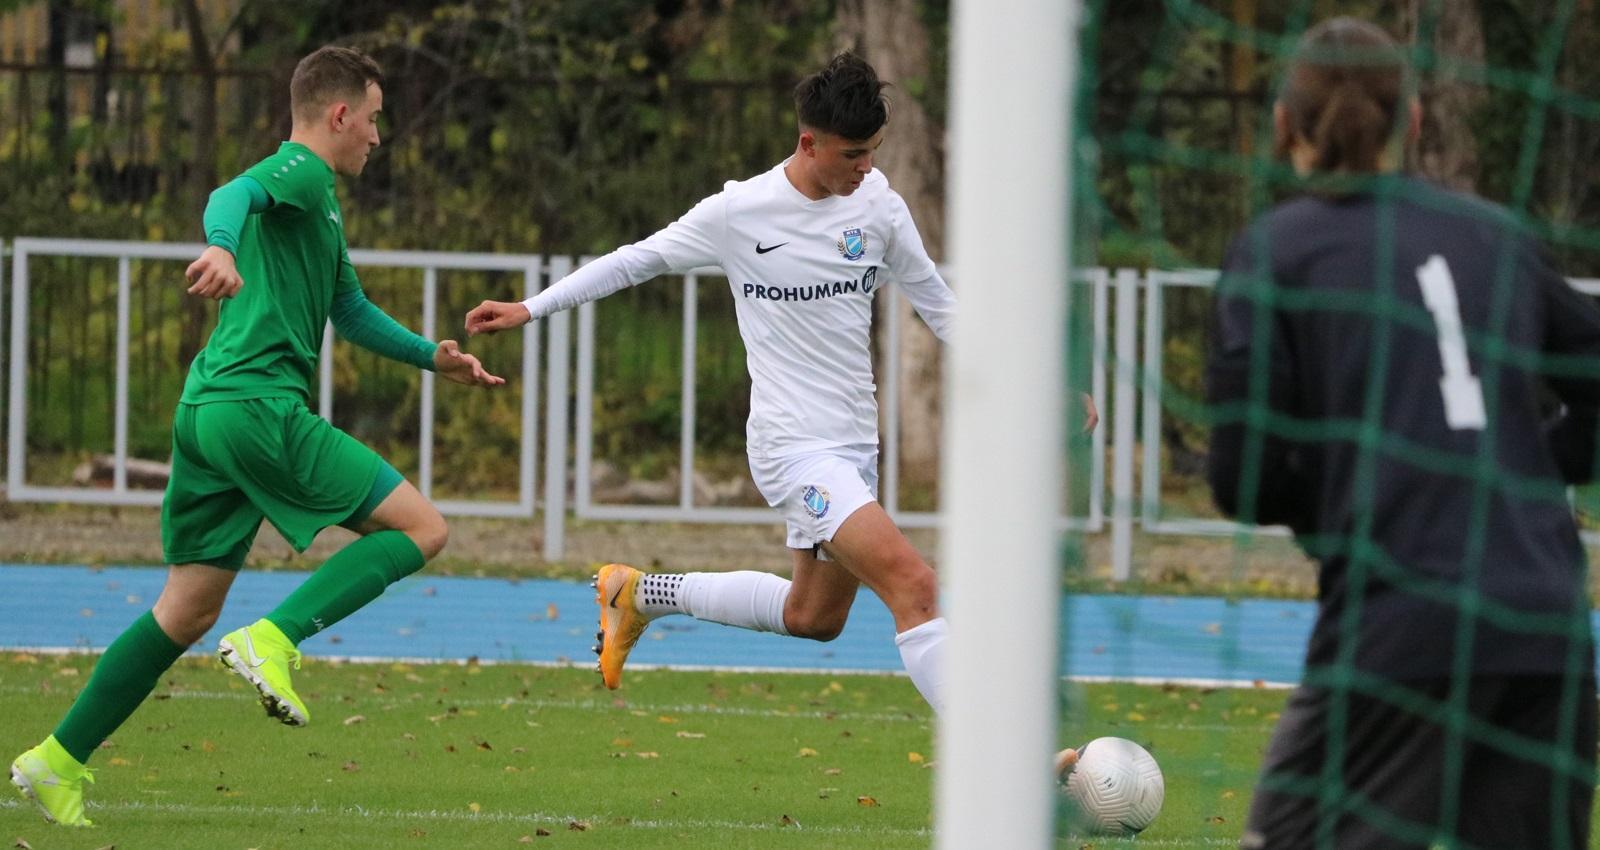 U17, U16: Két meccs, két győzelem, két mesternégyes (GALÉRIA)